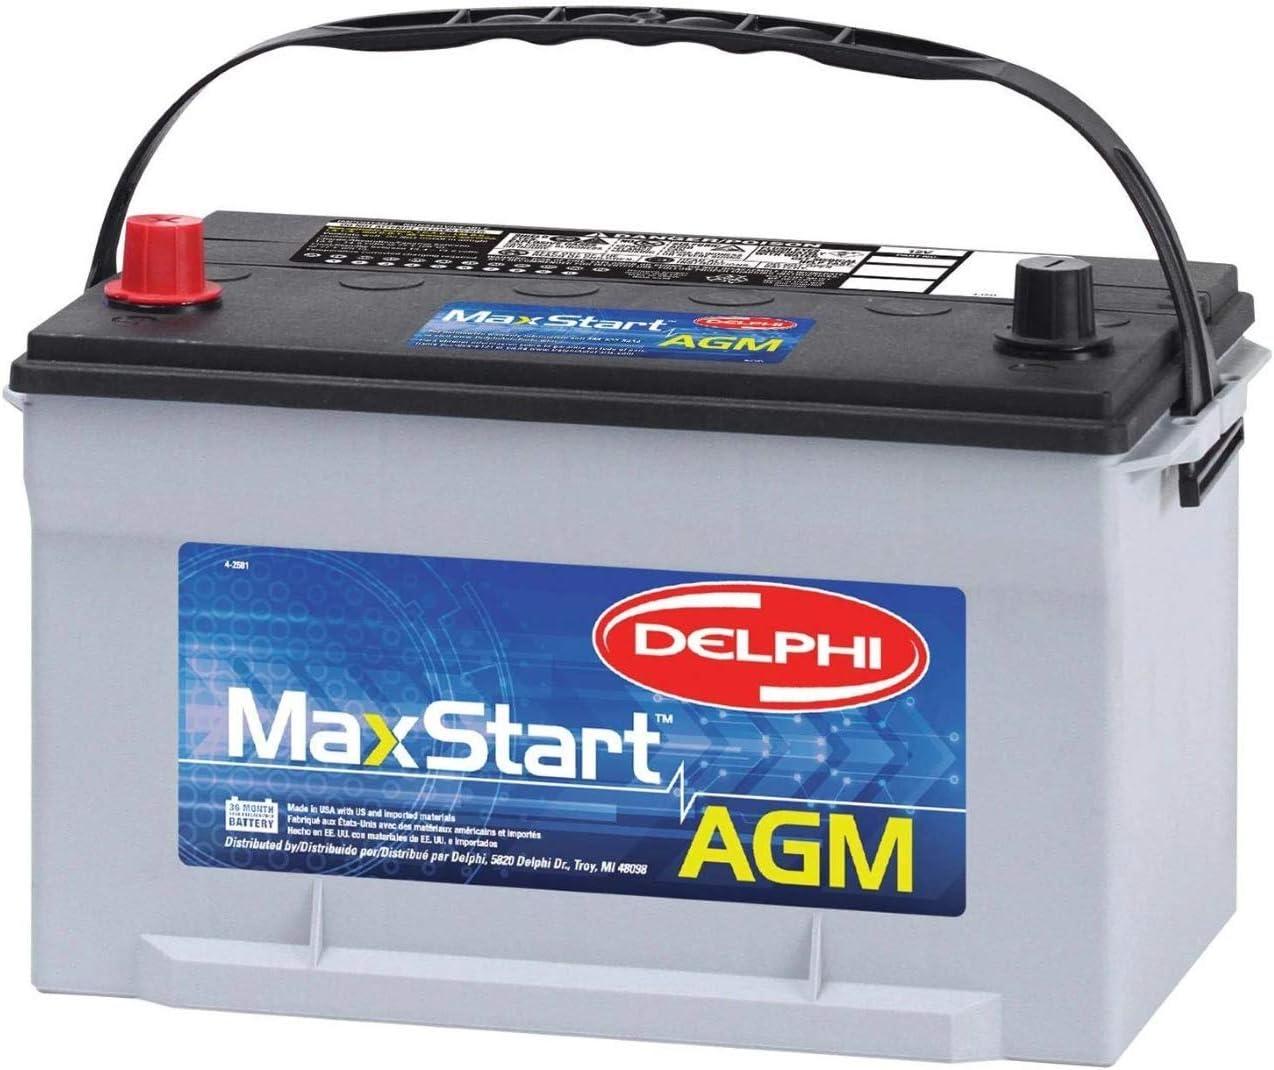 Delphi BU9065 MaxStart 70%OFFアウトレット 今季も再入荷 AGM Premium Battery Group Siz Automotive